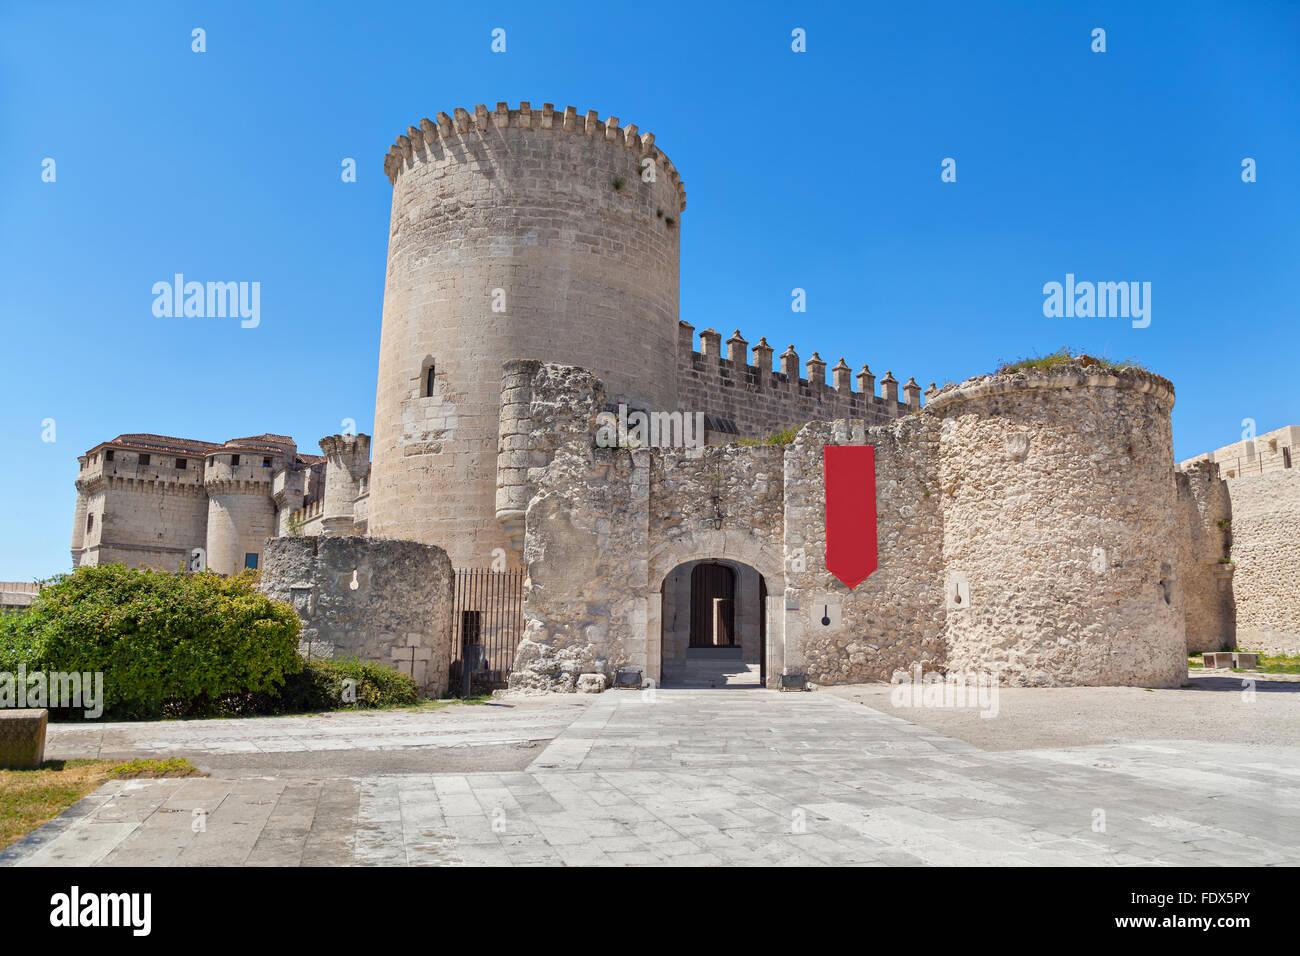 Entrance to Cuellar Castle, Segovia Province, Castile and Leon, Spain - Stock Image